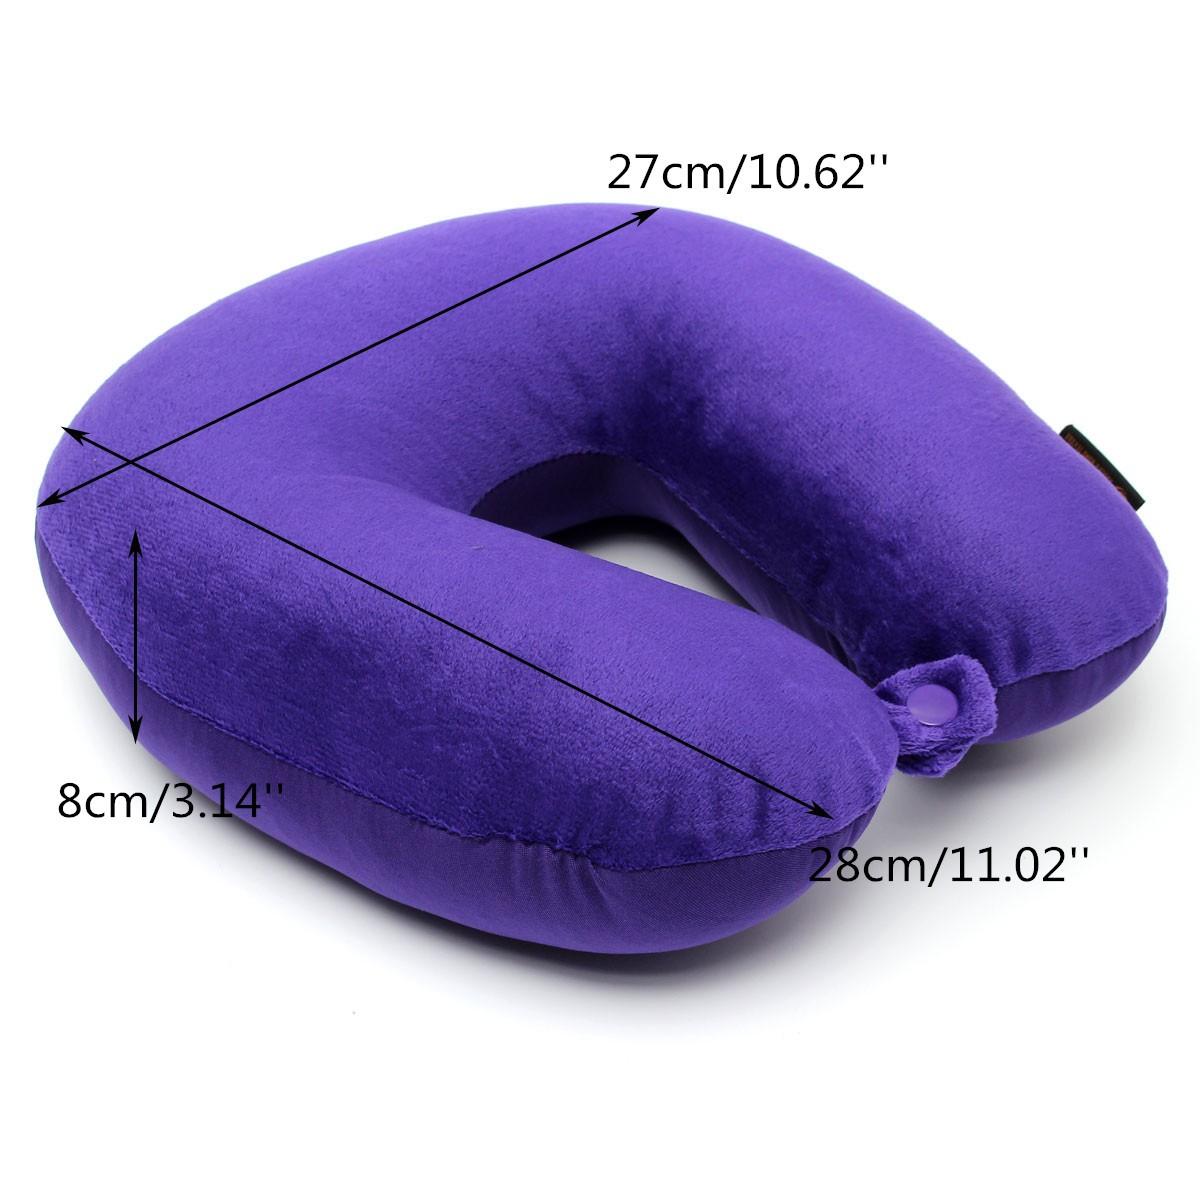 Memory Foam Particles U Shape Neck Head Rest Pillow Car Flight Travel Soft Nursing Cushion